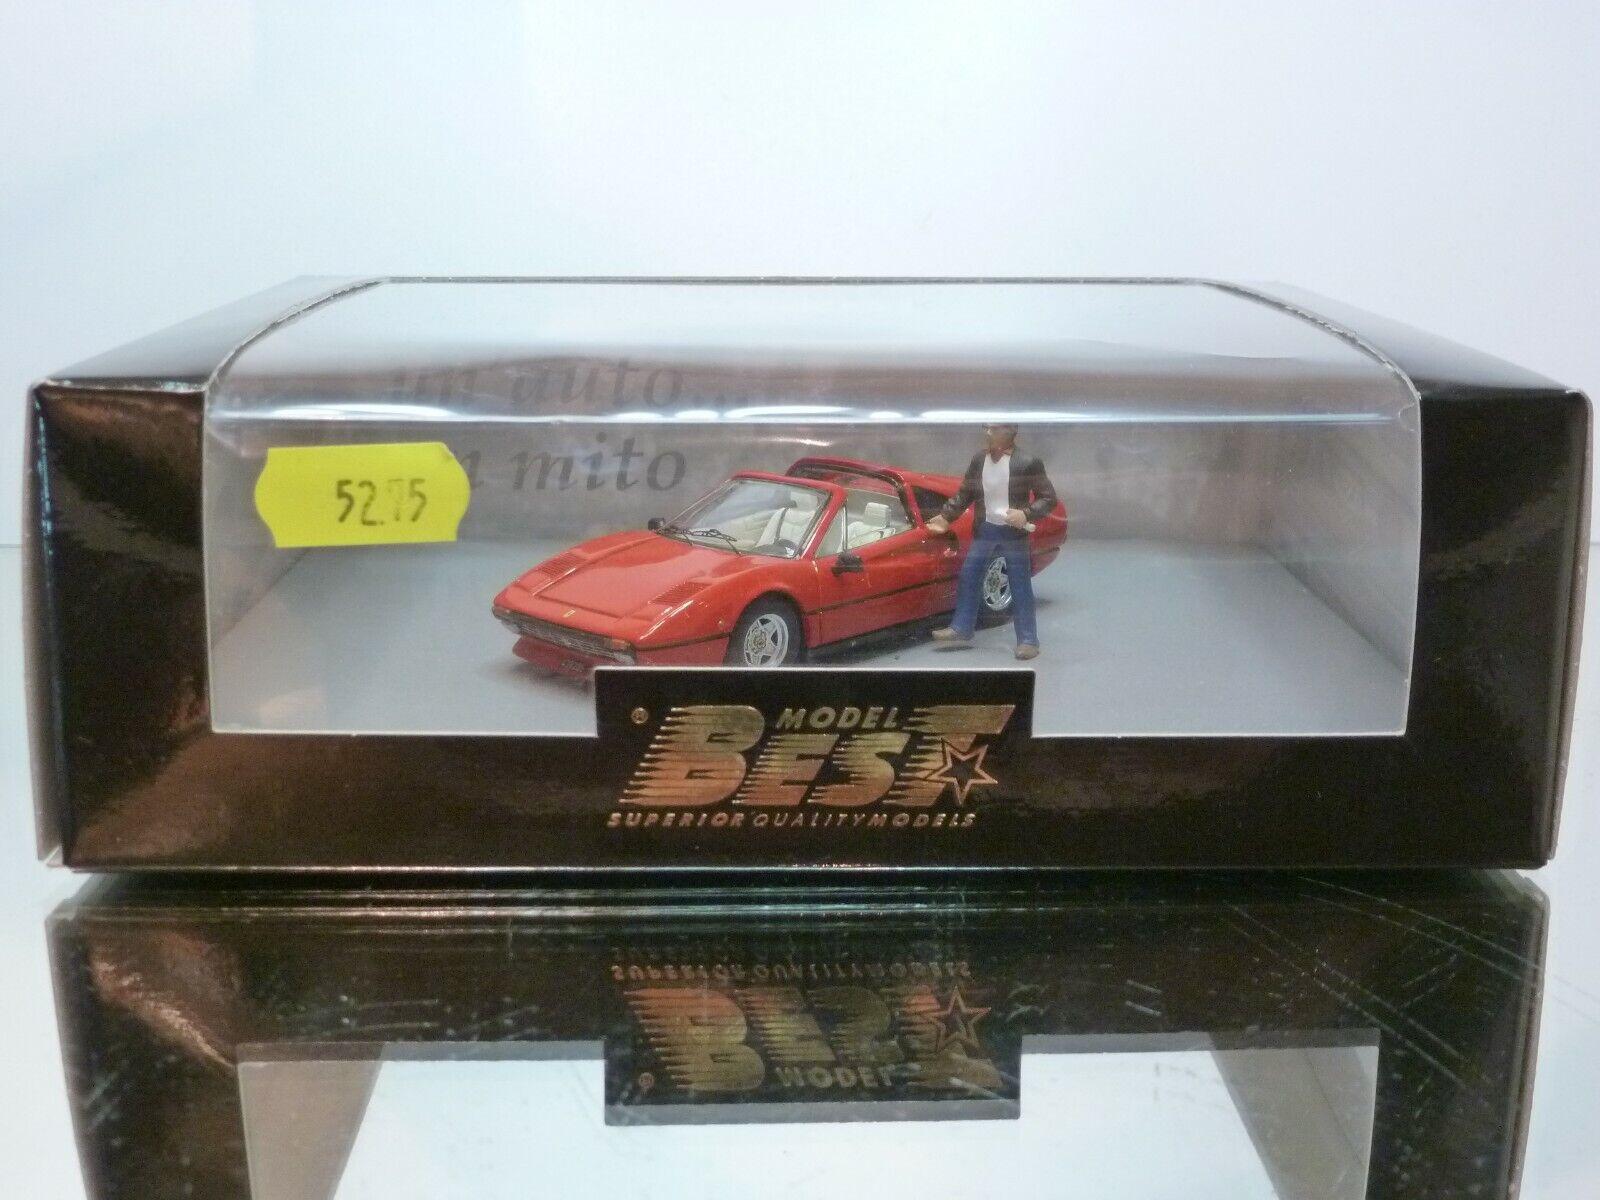 BEST 20032 FERRARI 308 GTS VILLENEUVE CAR 1982 - RED 1 43 - EXCELLENT IN BOX